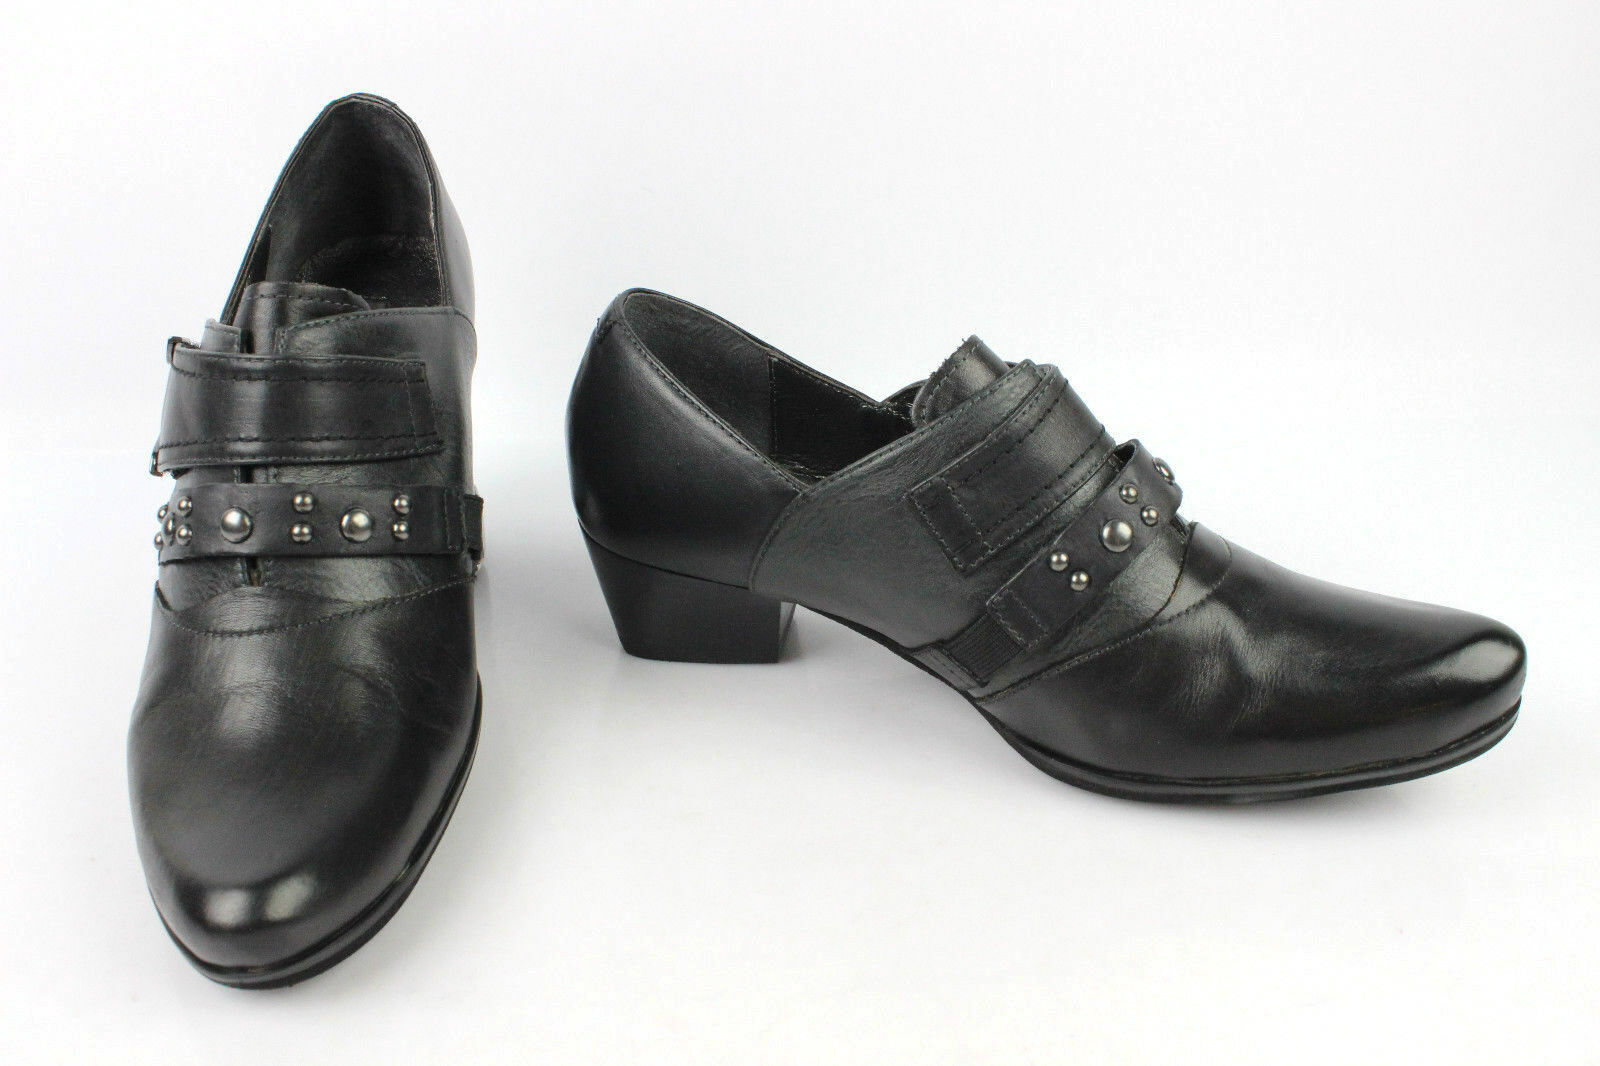 3cfd13ce5037e Court Tredters FUGITIVE Black Leather T 37 MINT shoes nrxdal1575 ...